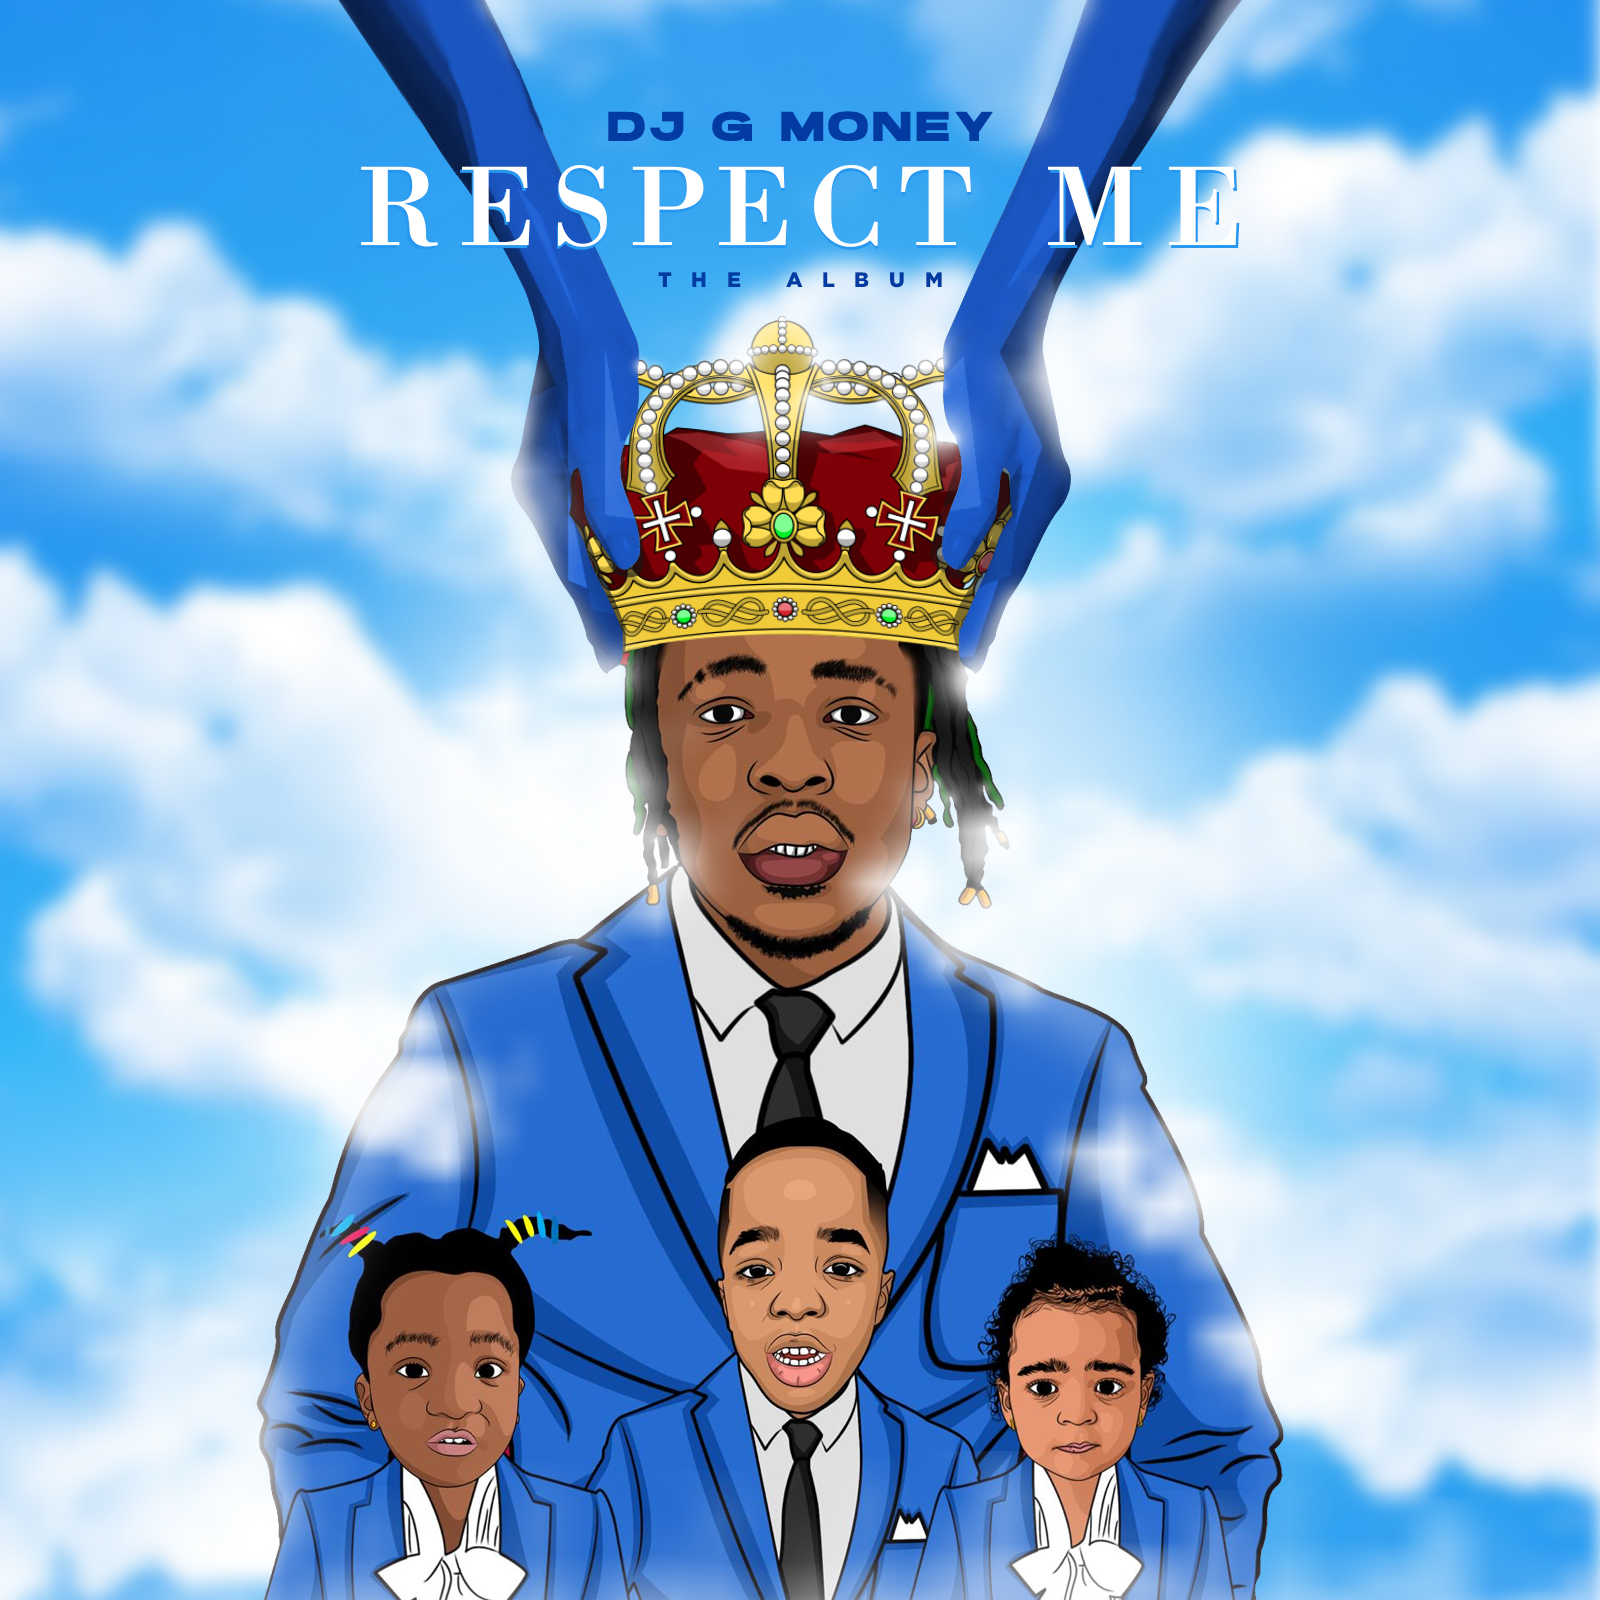 RESPECT ME THE ALBUM Image